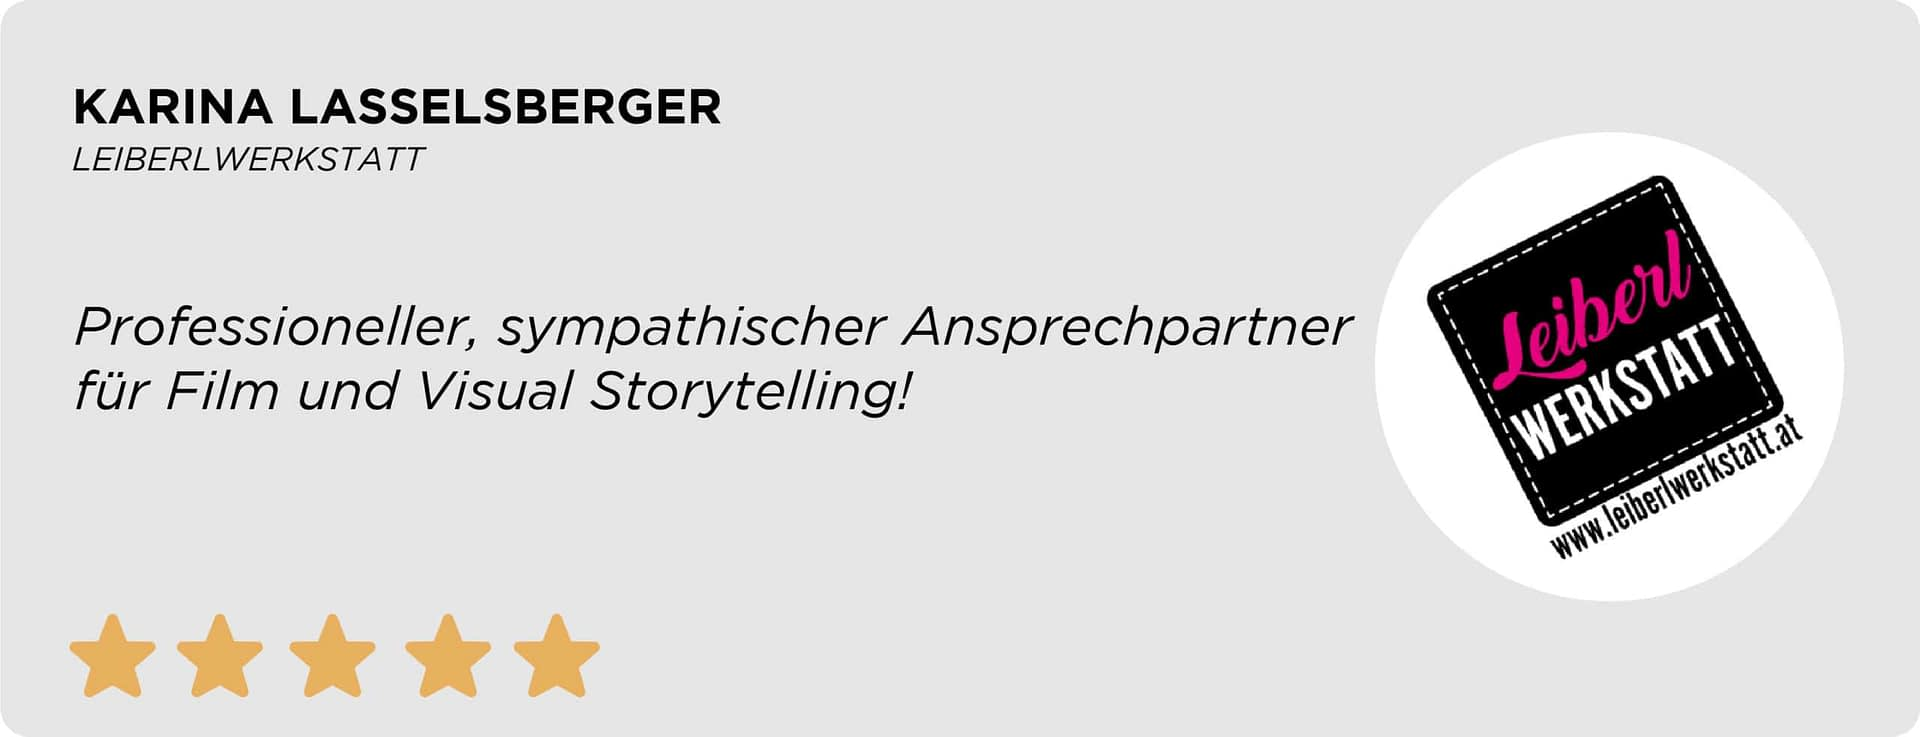 leiberlwerkstatt_karina_lasselsberger